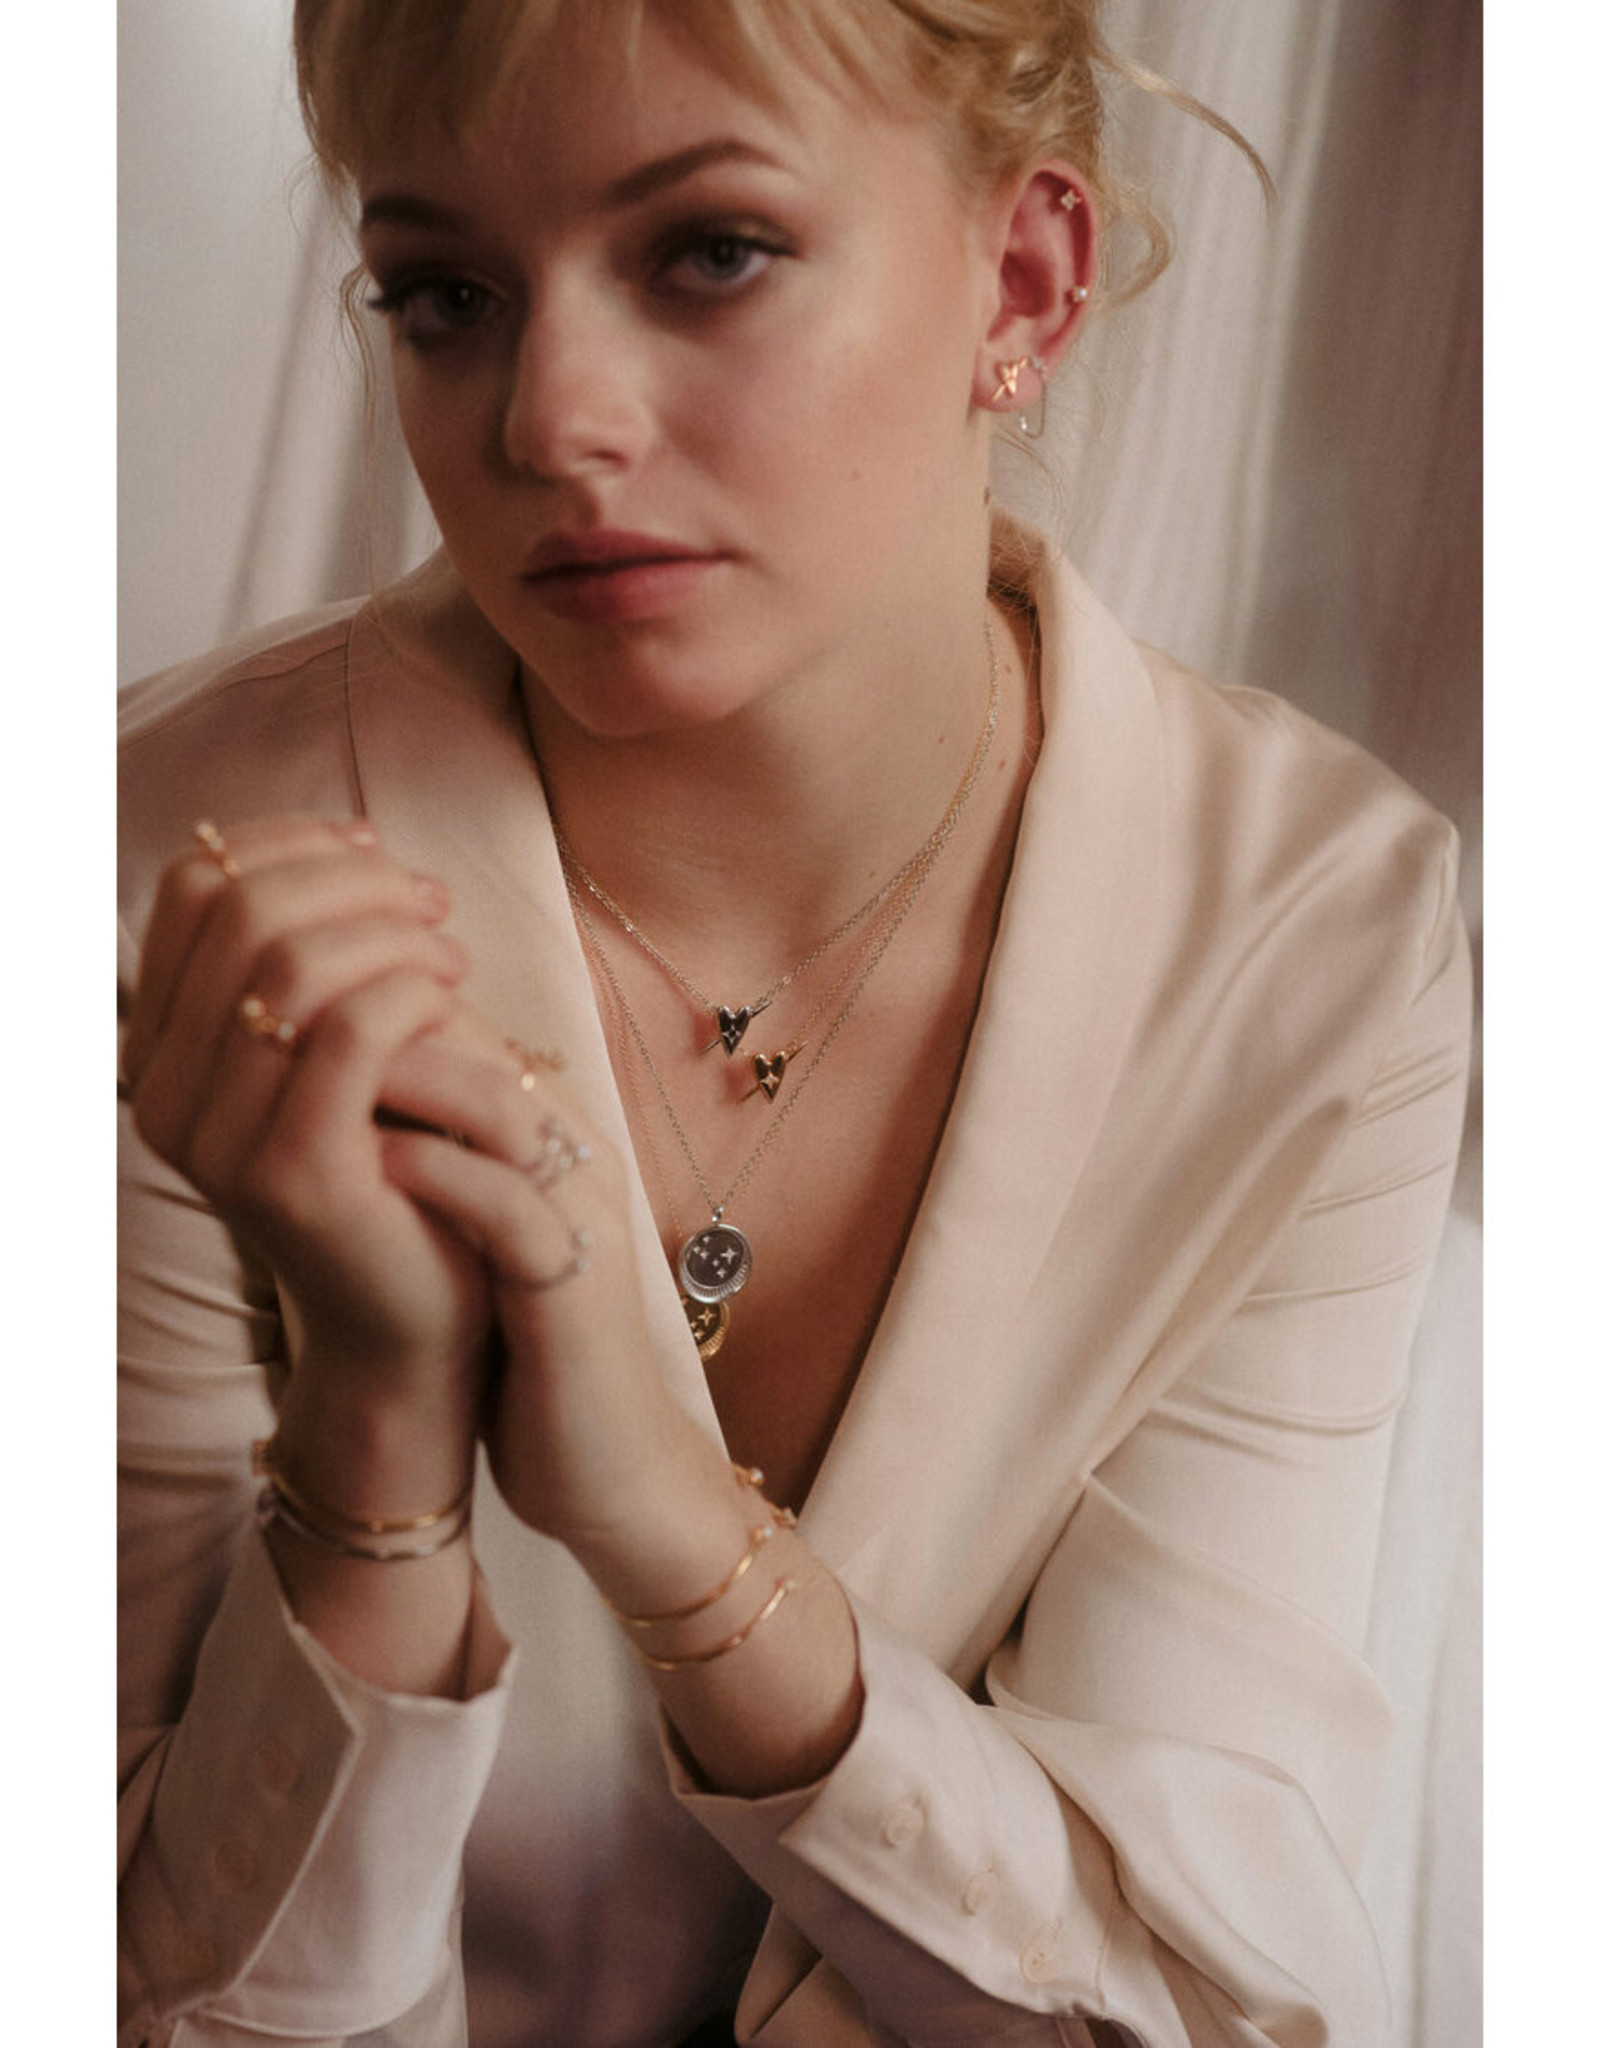 Sarah Mulder Jewelry Silver Alex Short Chain Studs - Onyx